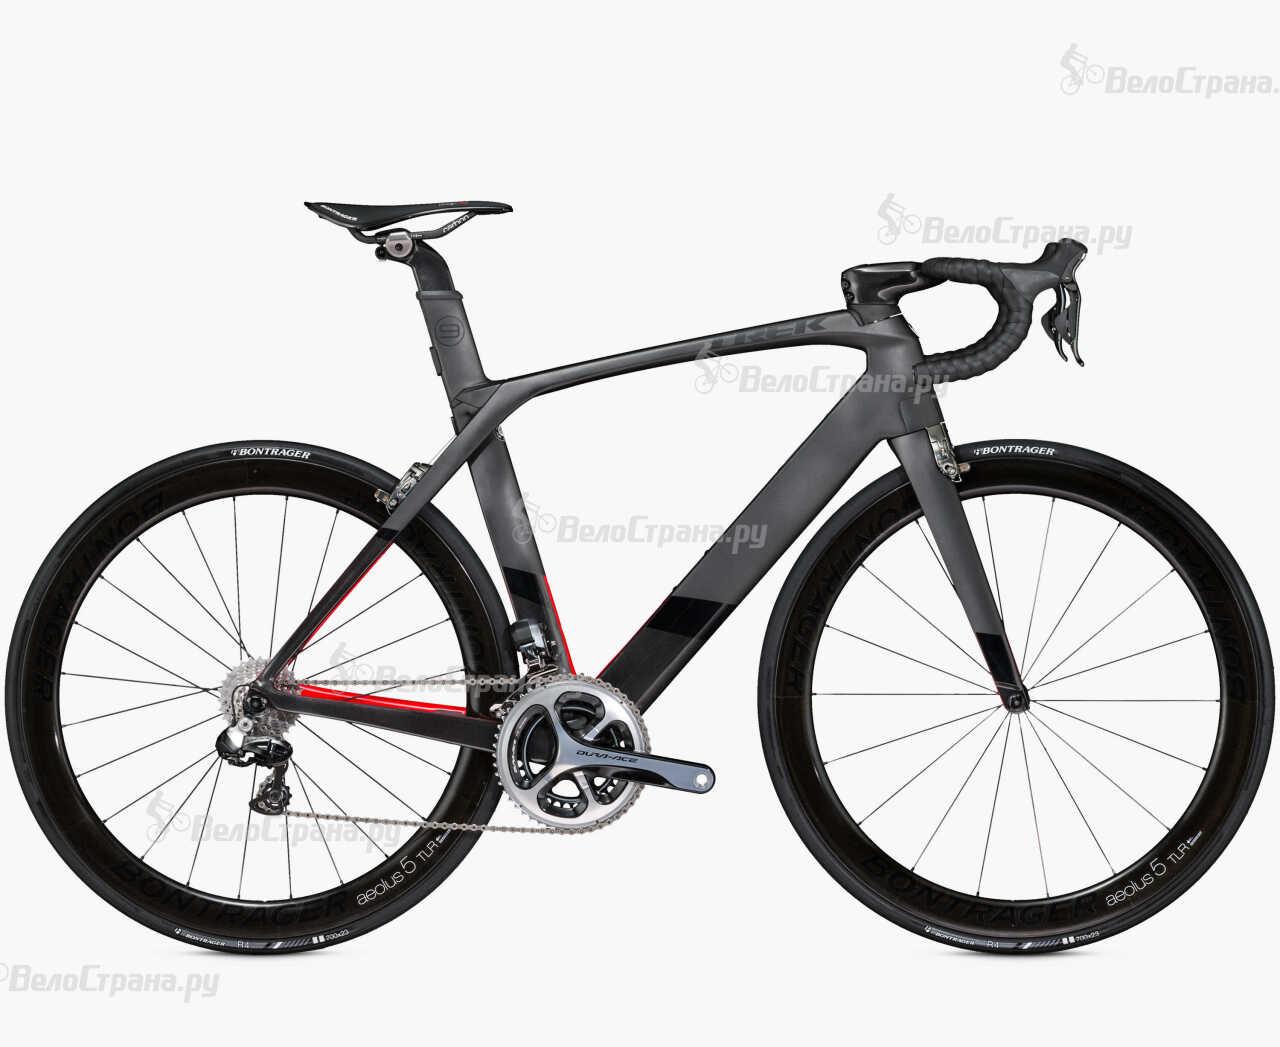 Велосипед Trek MADONE 9.9 C H2 (2017) велосипед trek 1 2 c h2 2013